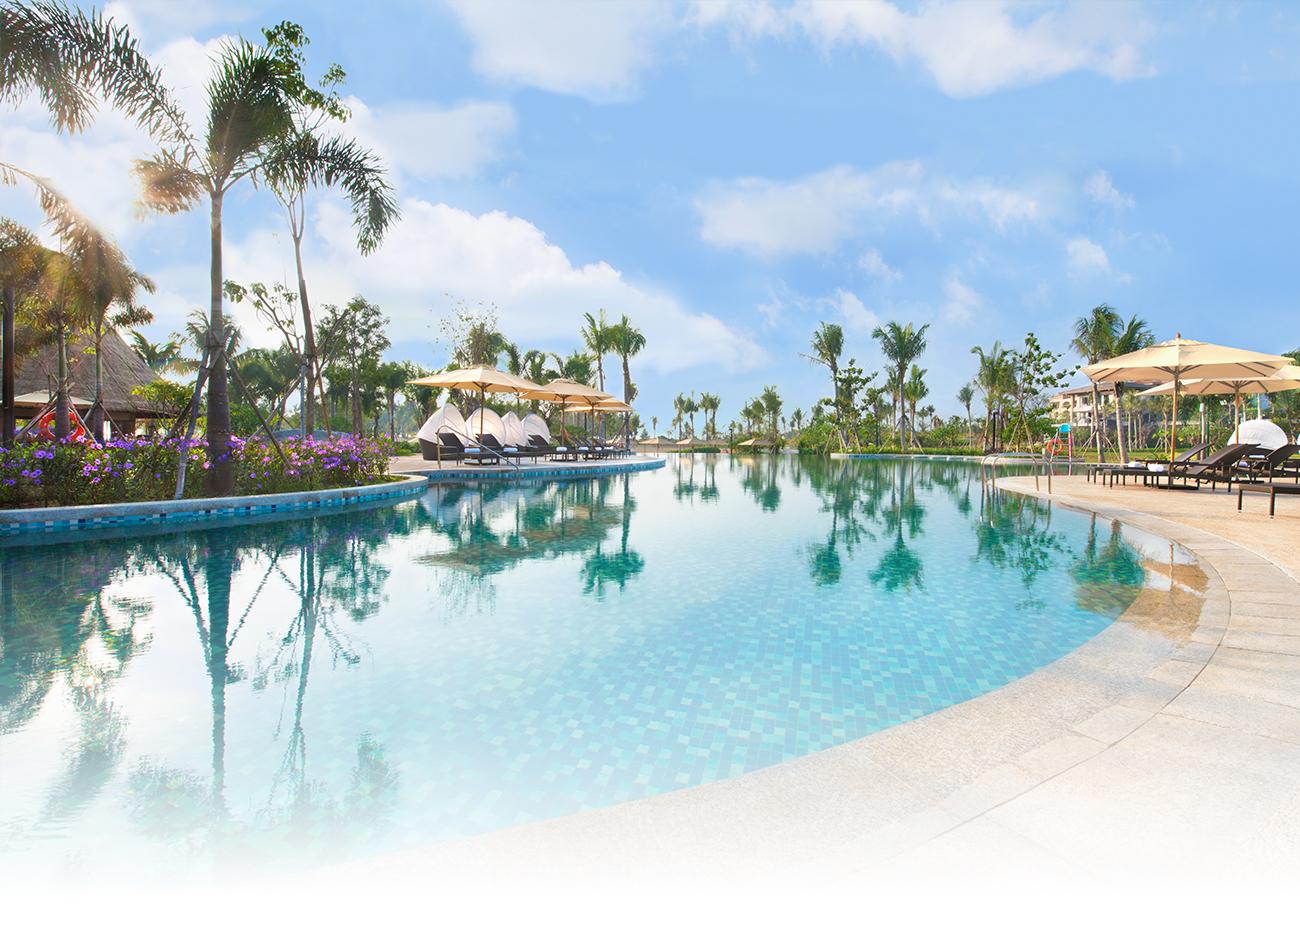 Shangri-La Luxury Circle Program Changes Feb. 10